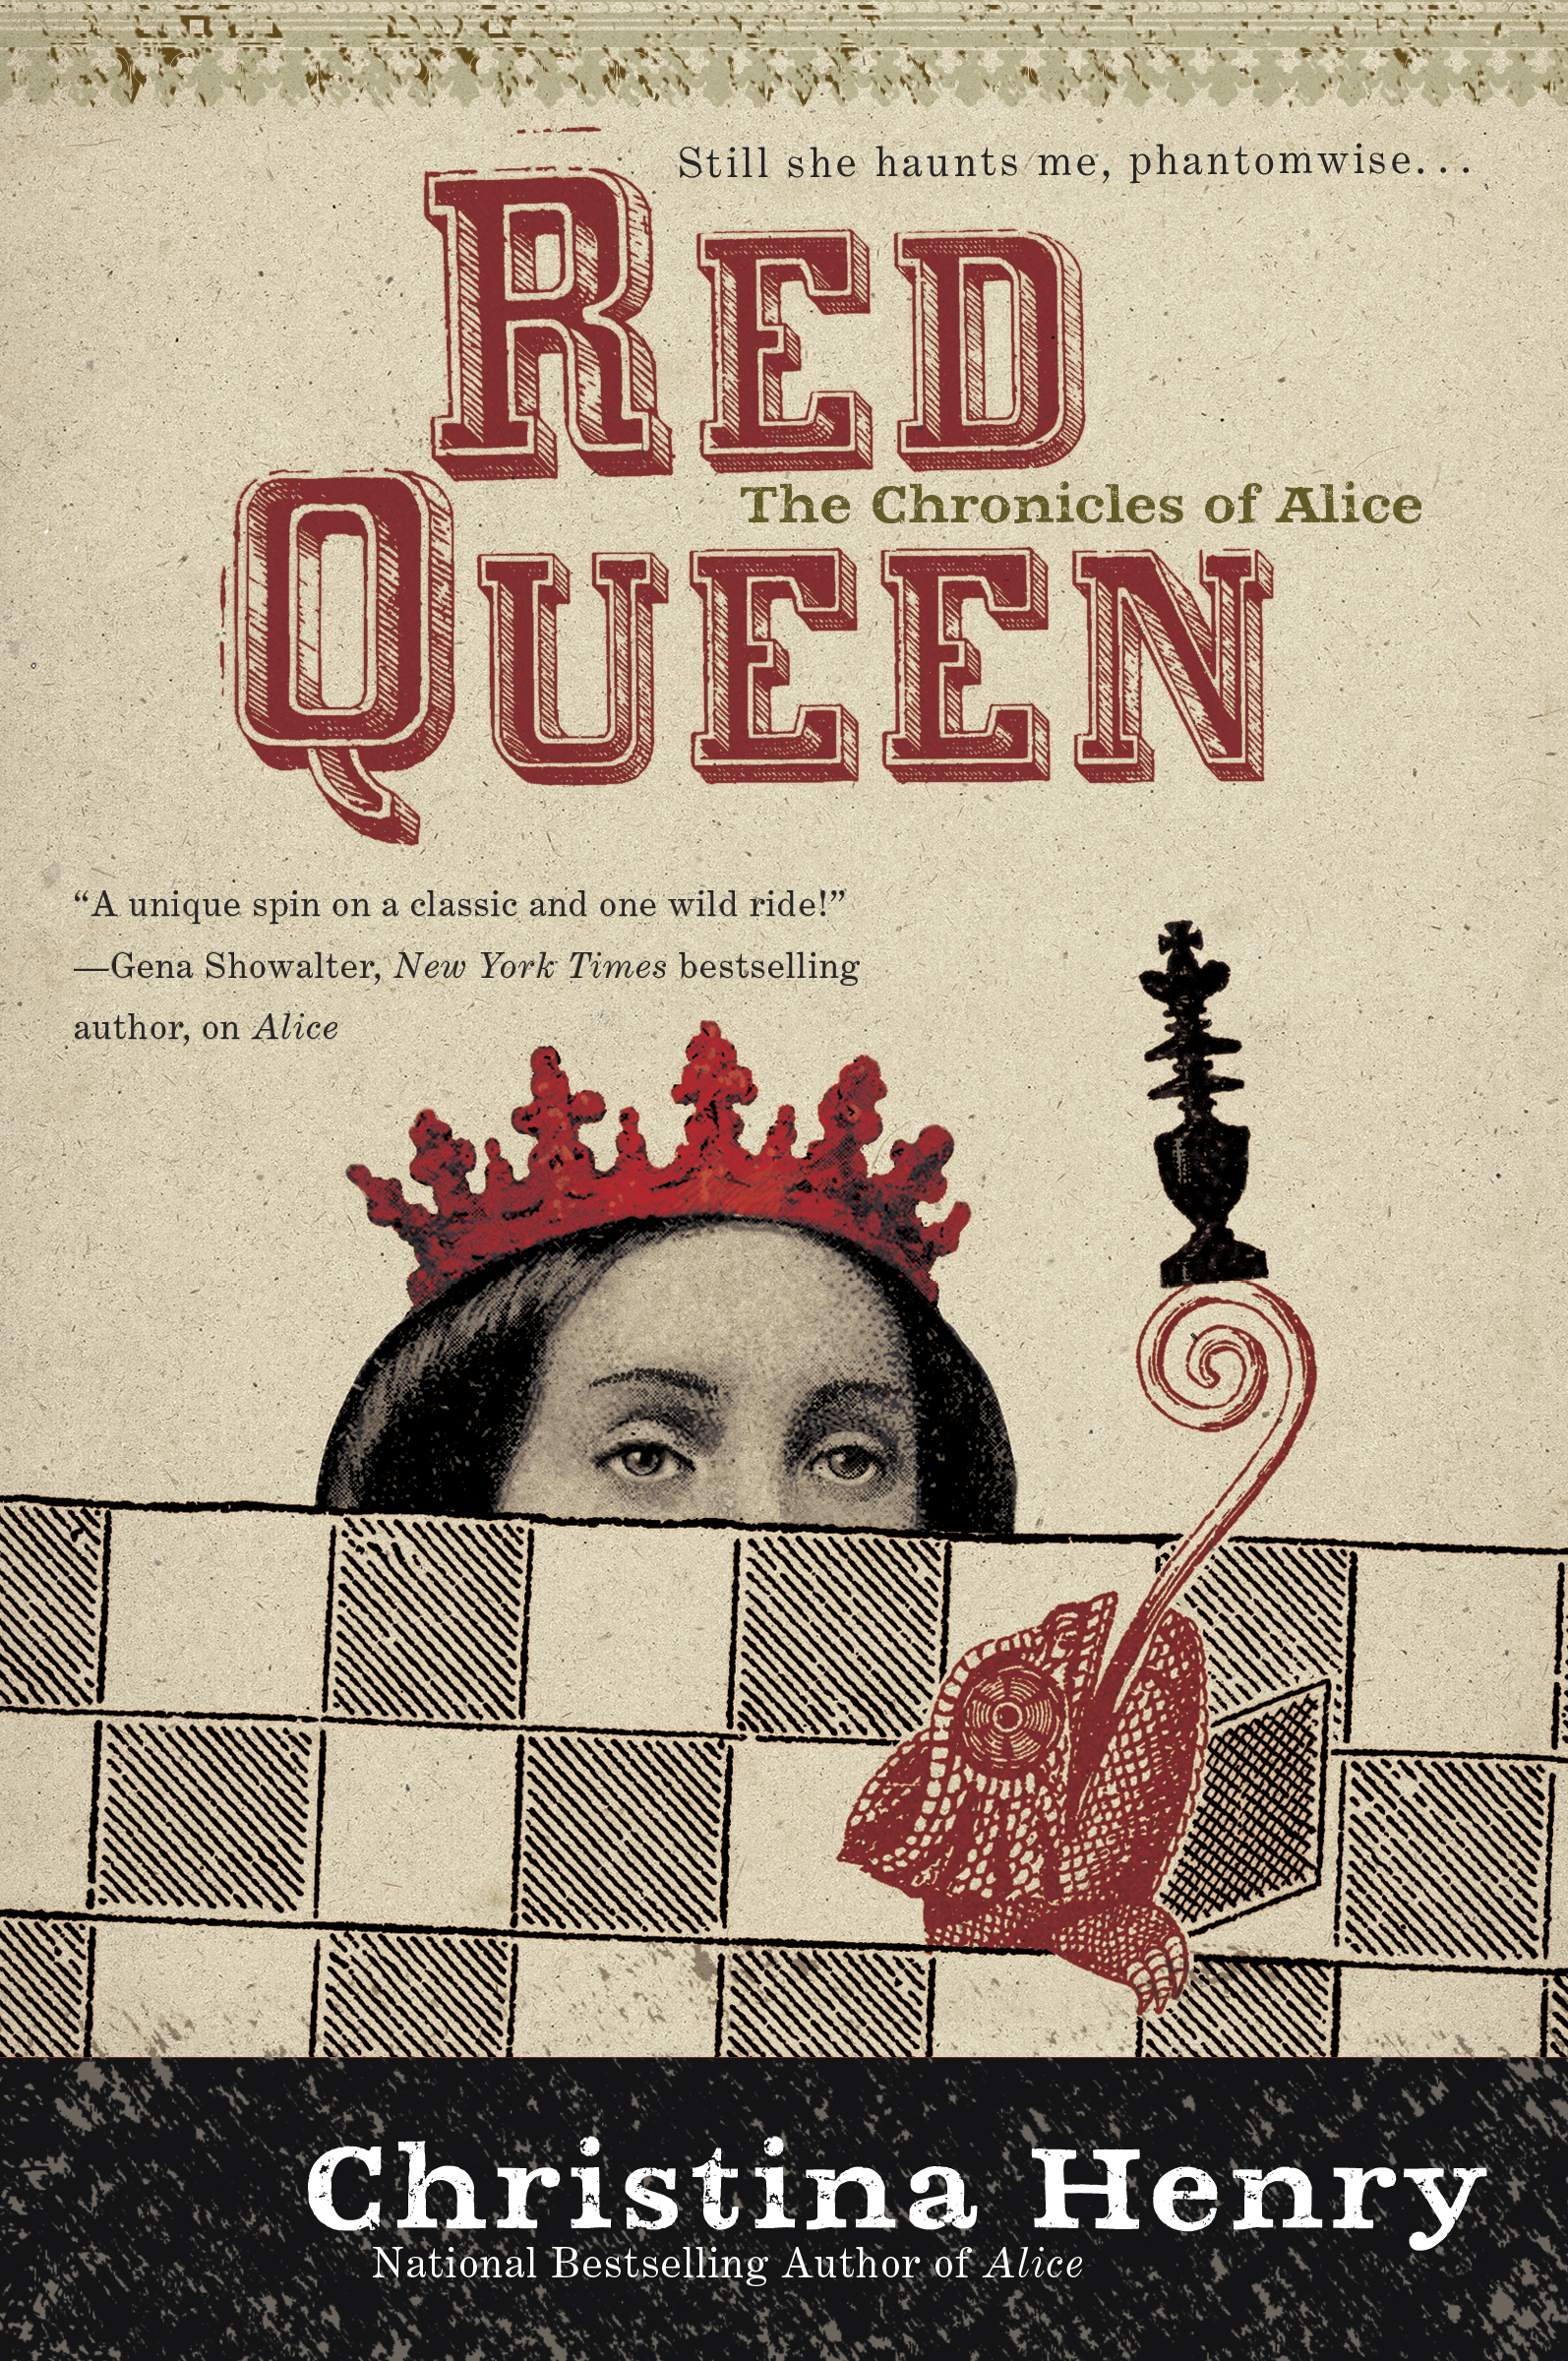 red_queen_front mech.indd